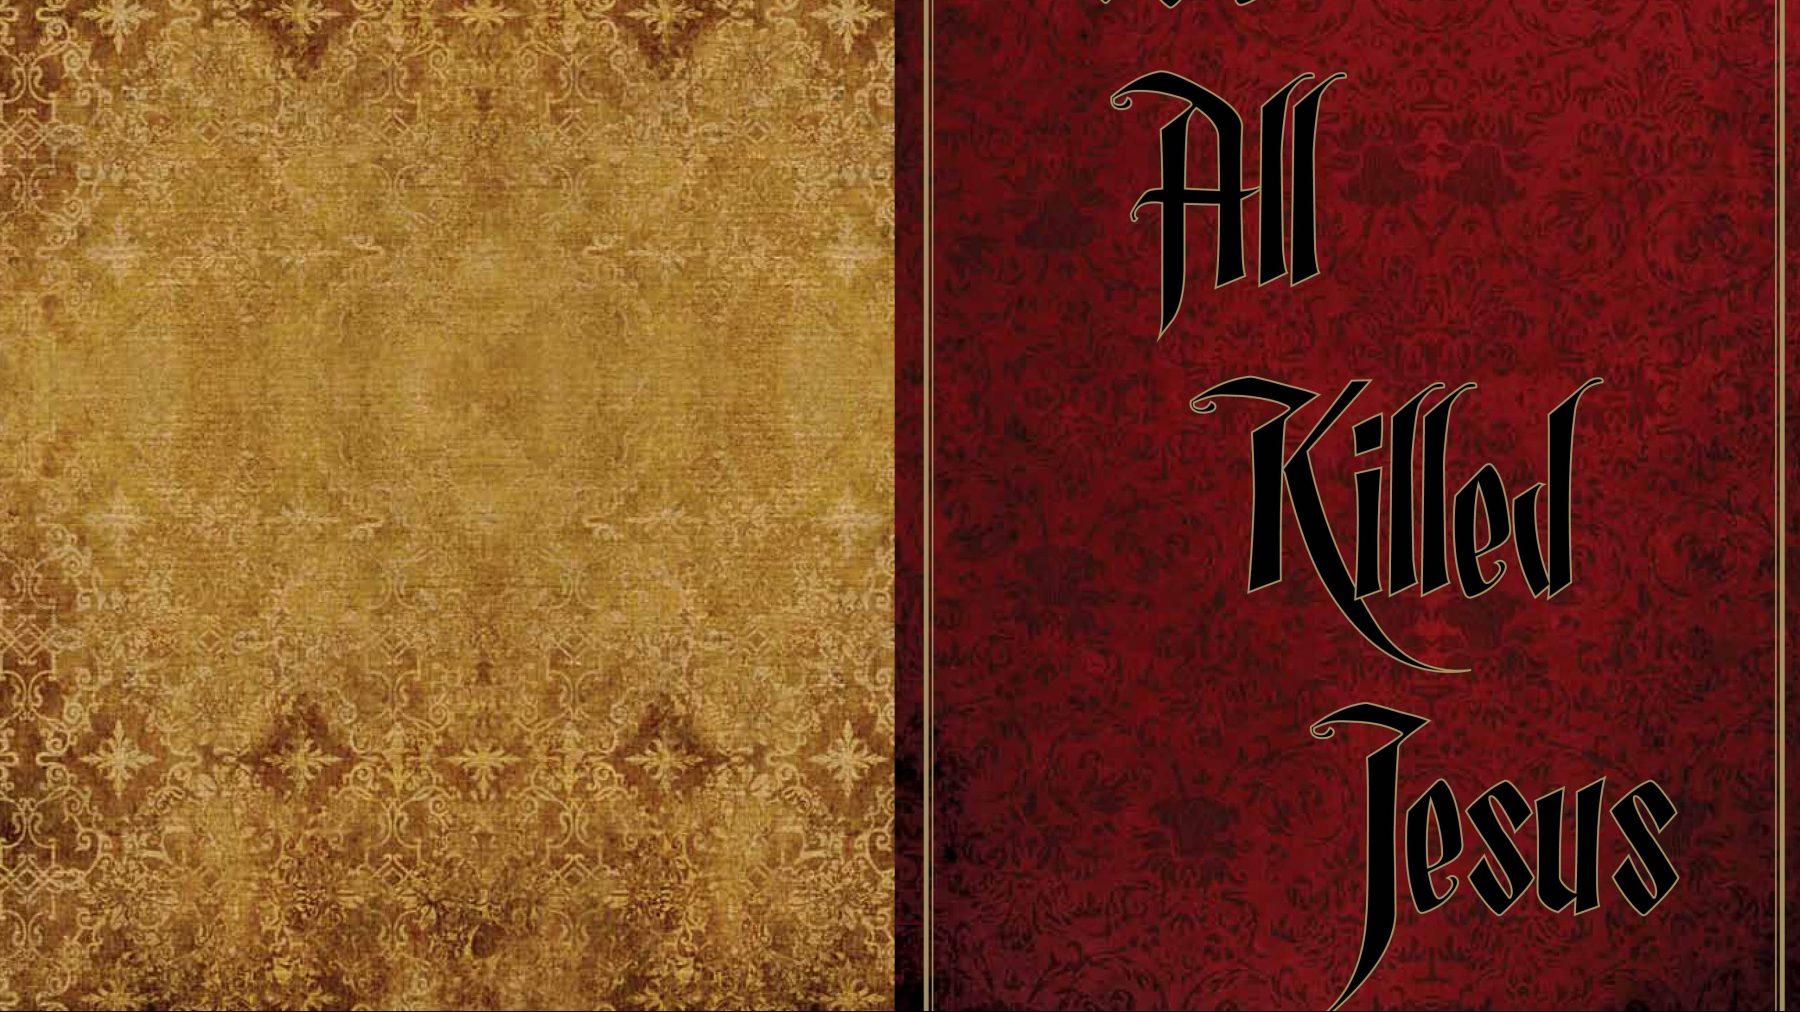 We All Killed Jesus